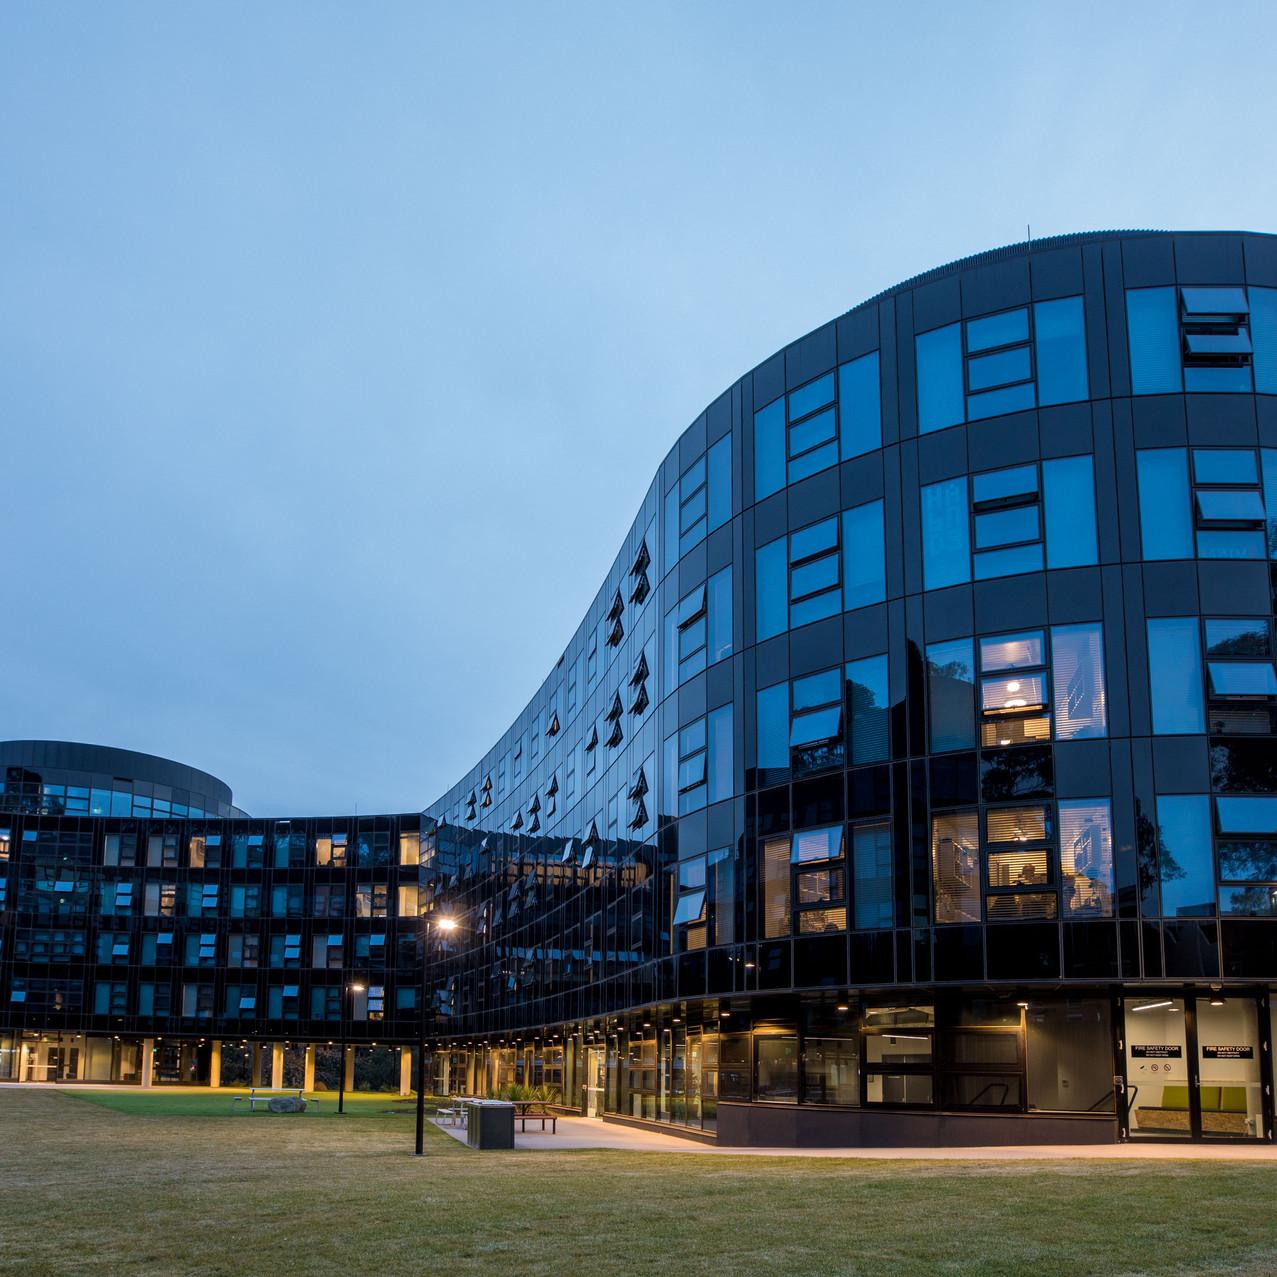 australian-national-university-anu-15106